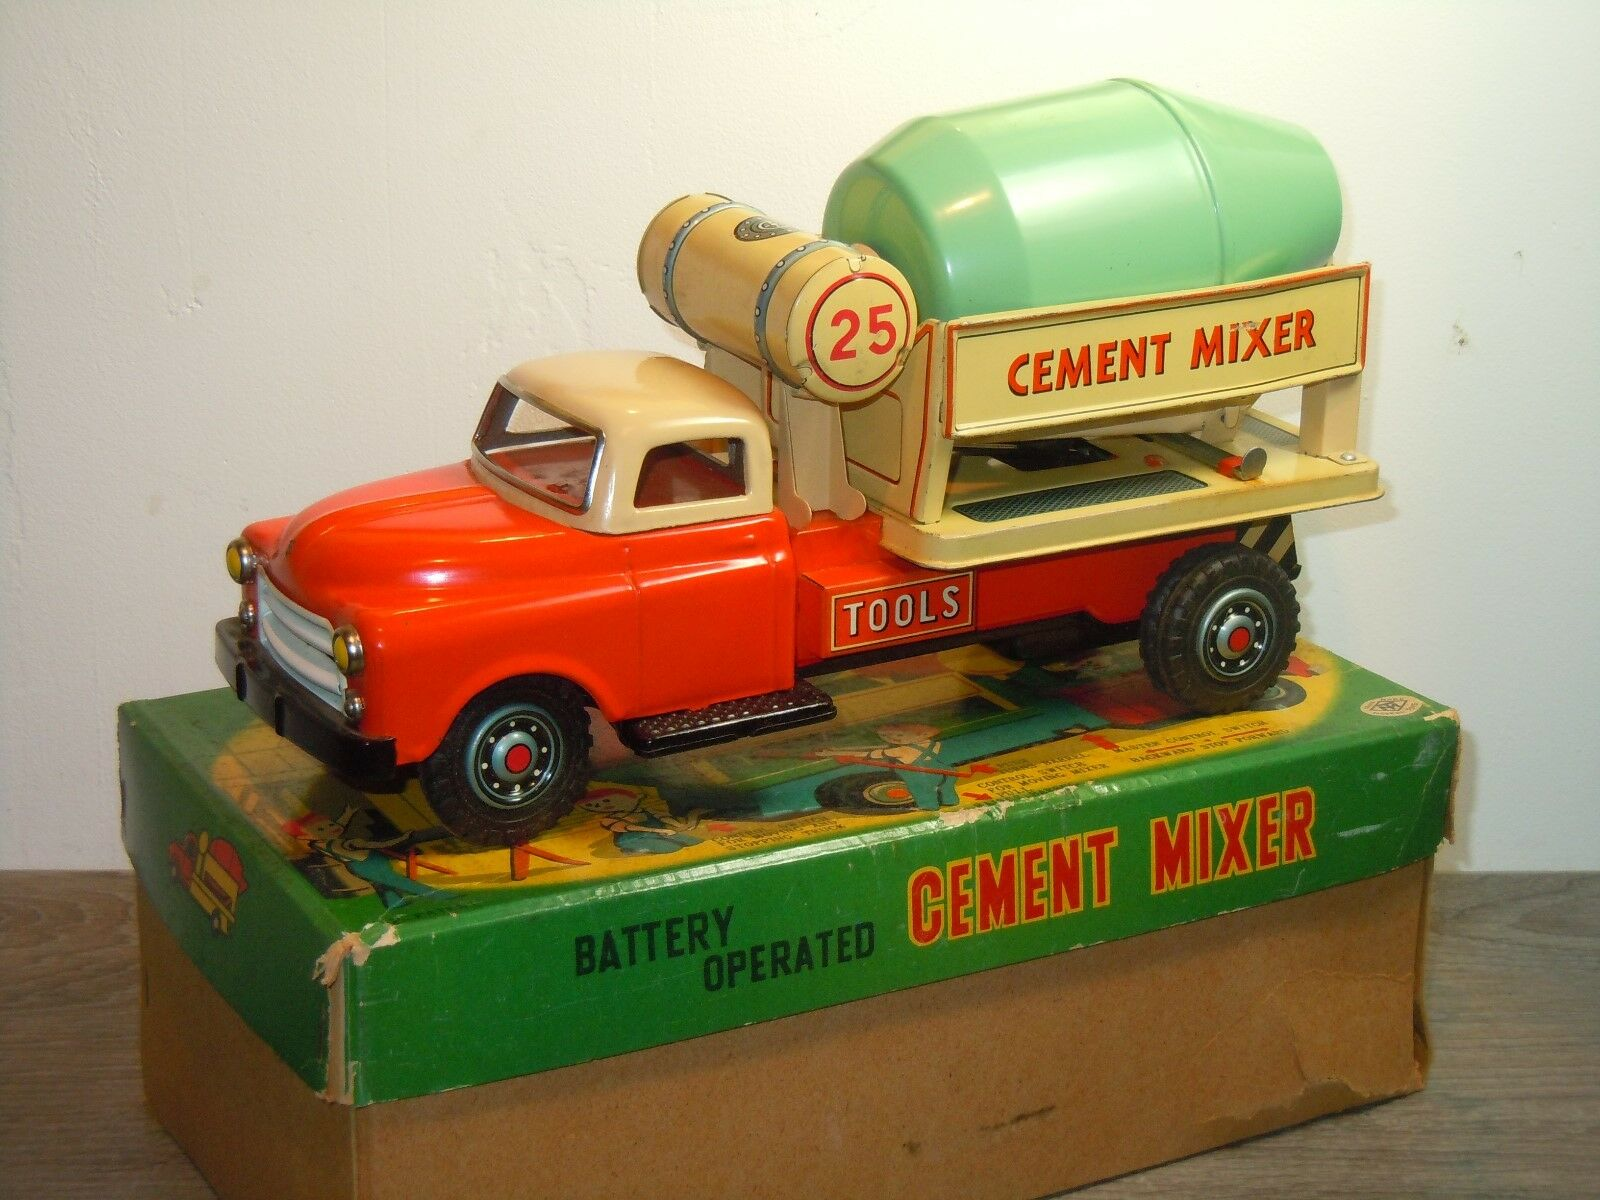 Battery Operated Cement Mixer - Modern Toys Masudaya Japan in Box *36182